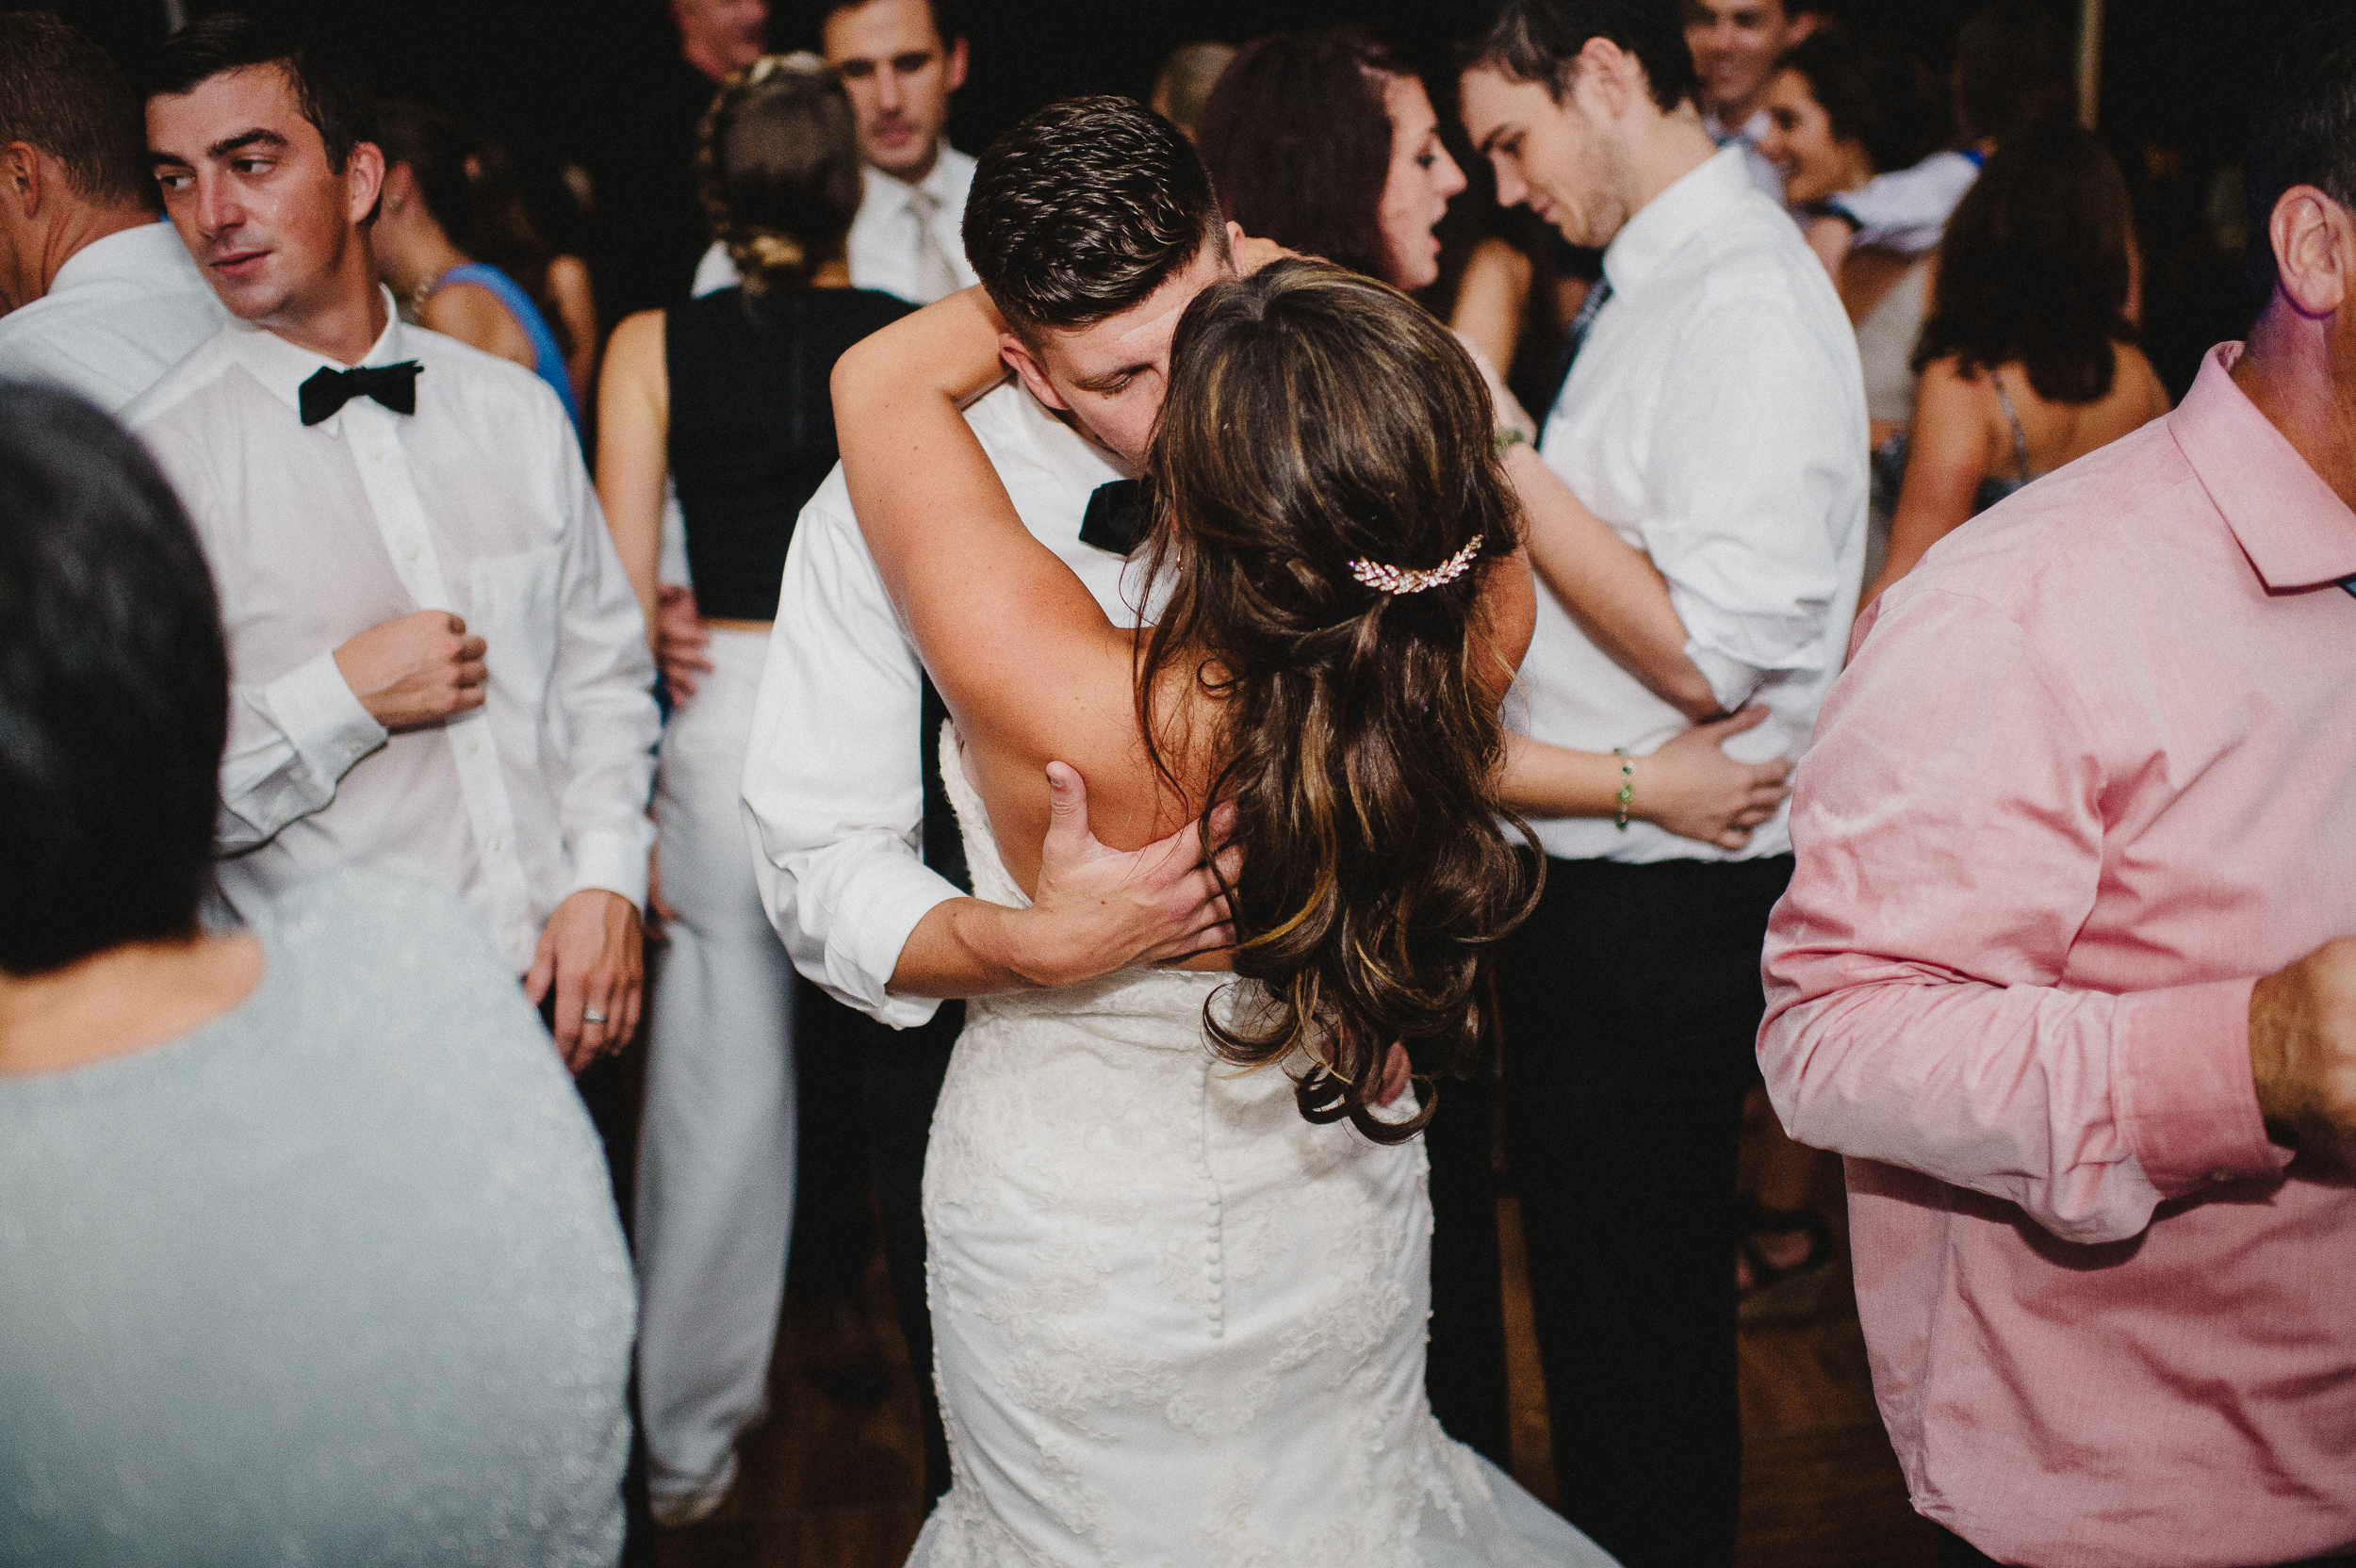 delaware-estate-wedding-photographer-pat-robinson-photography-137.jpg